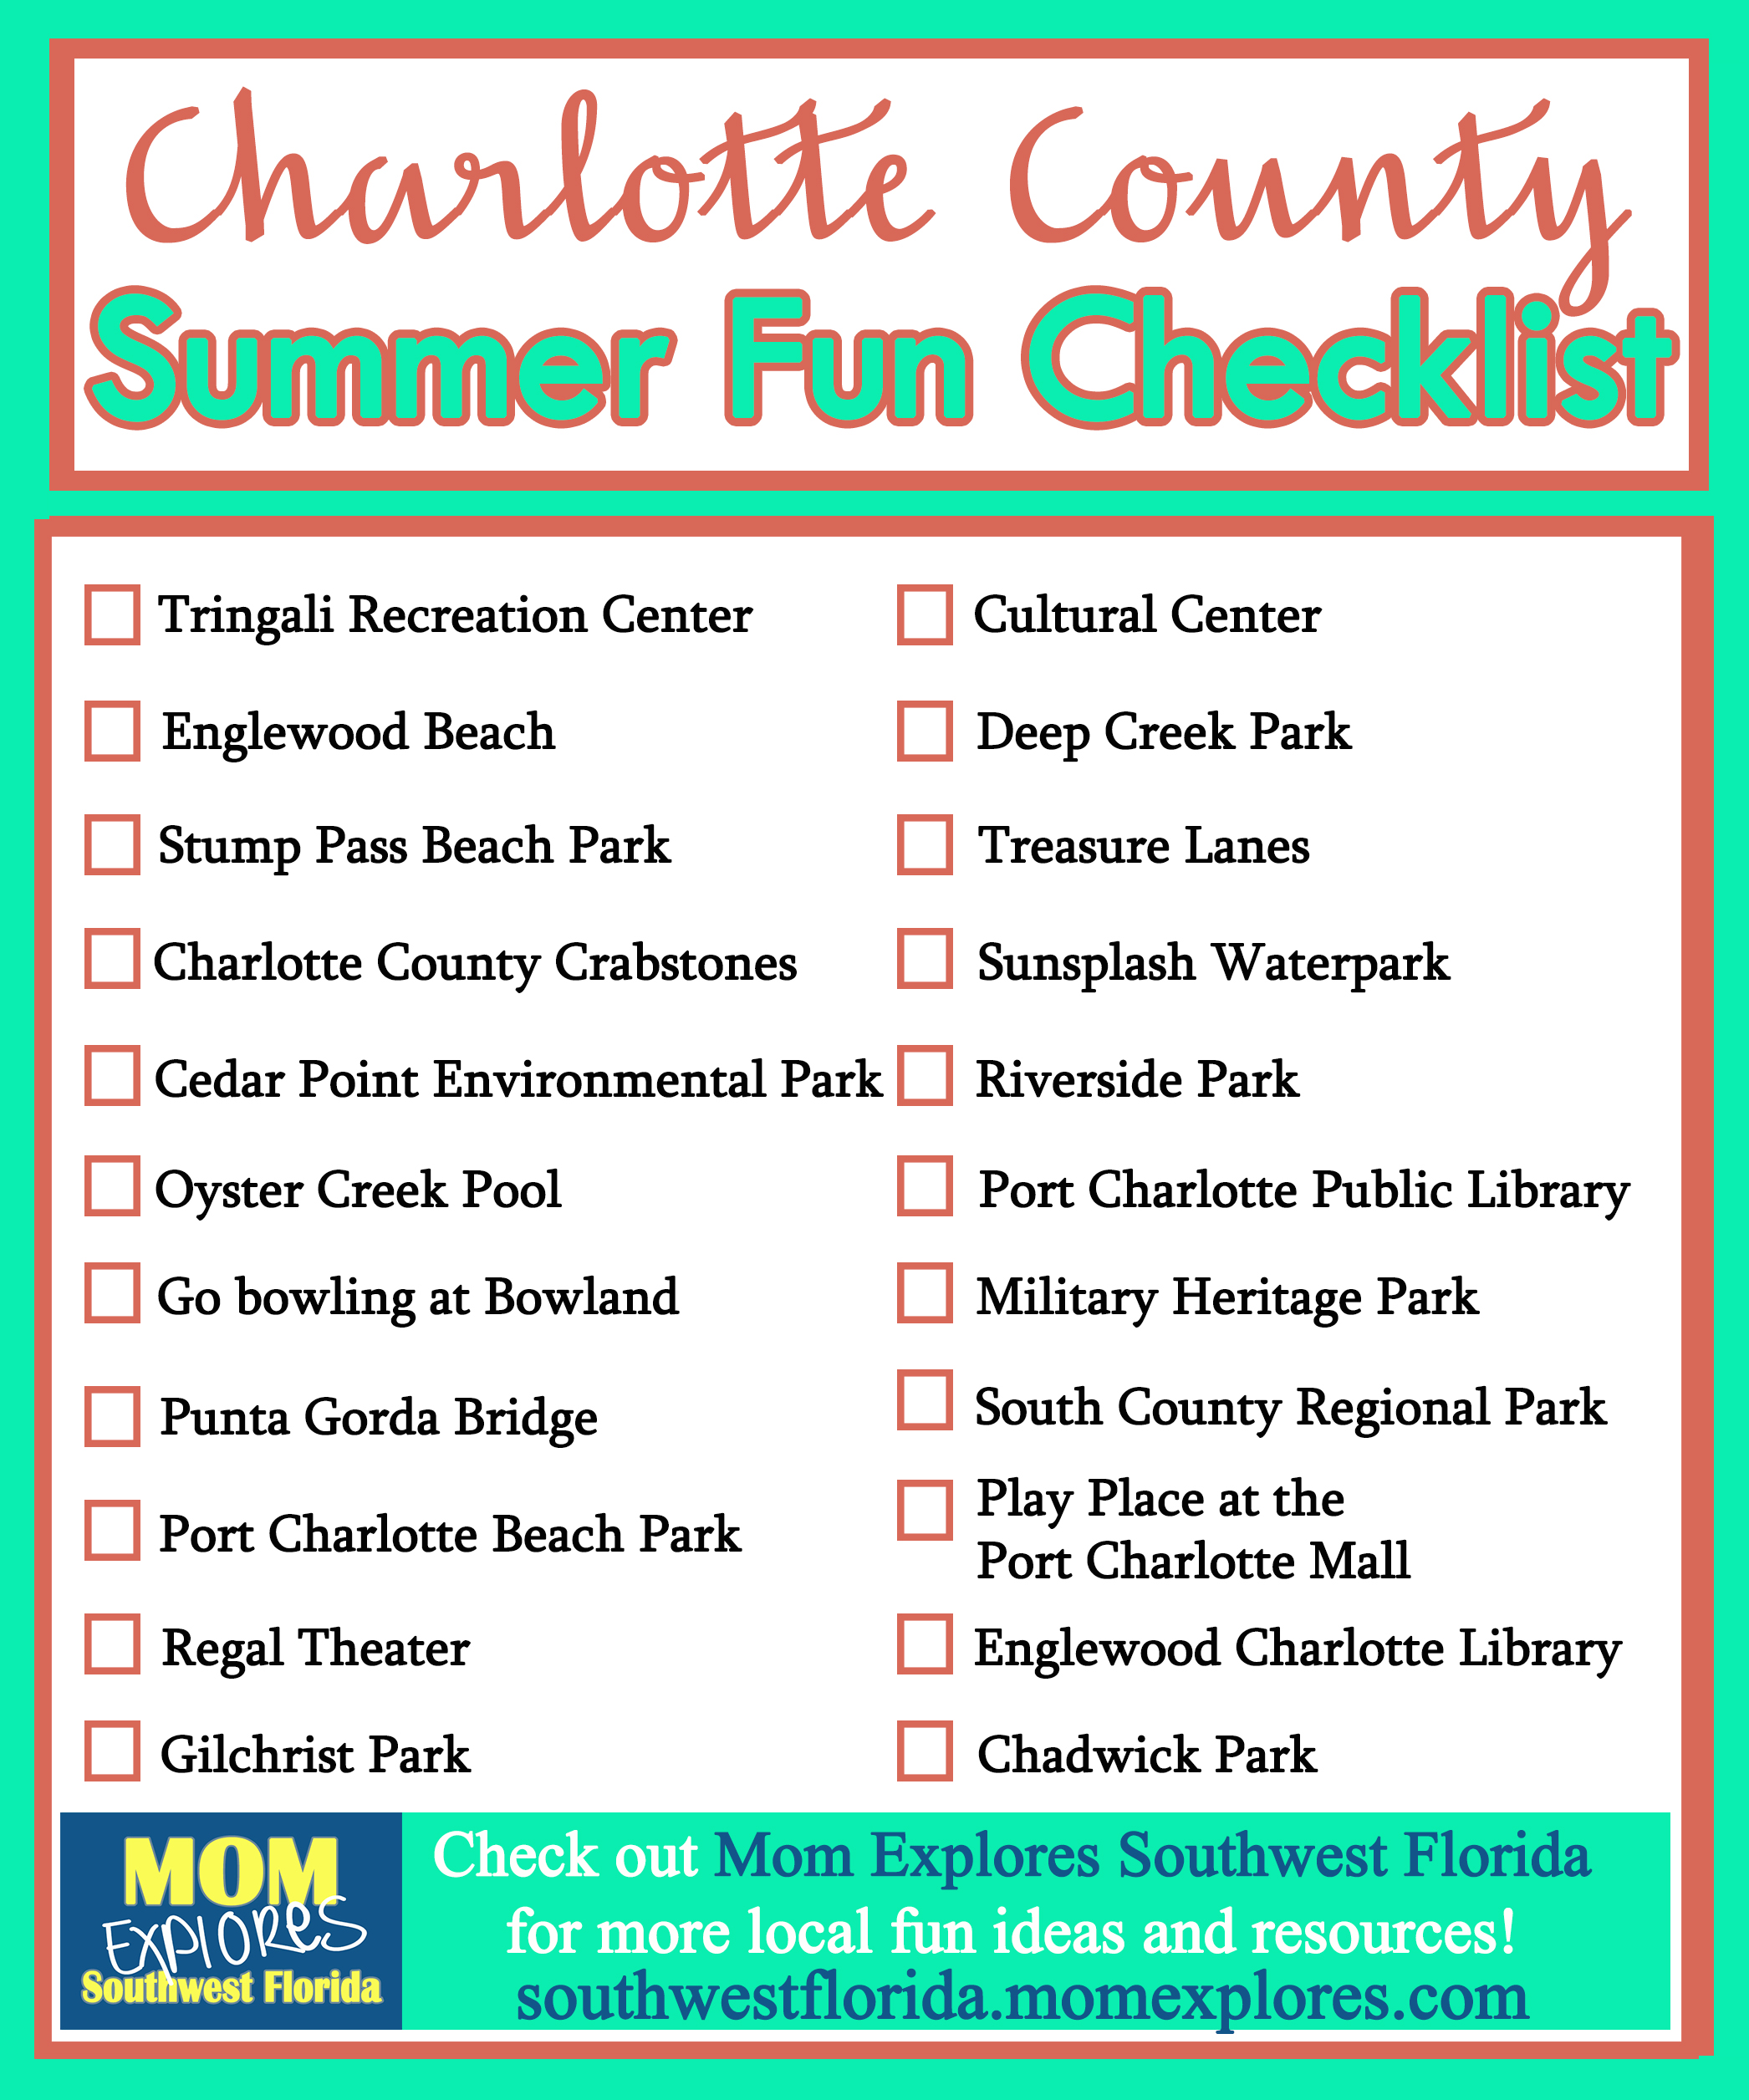 Charlotte's web coupon code